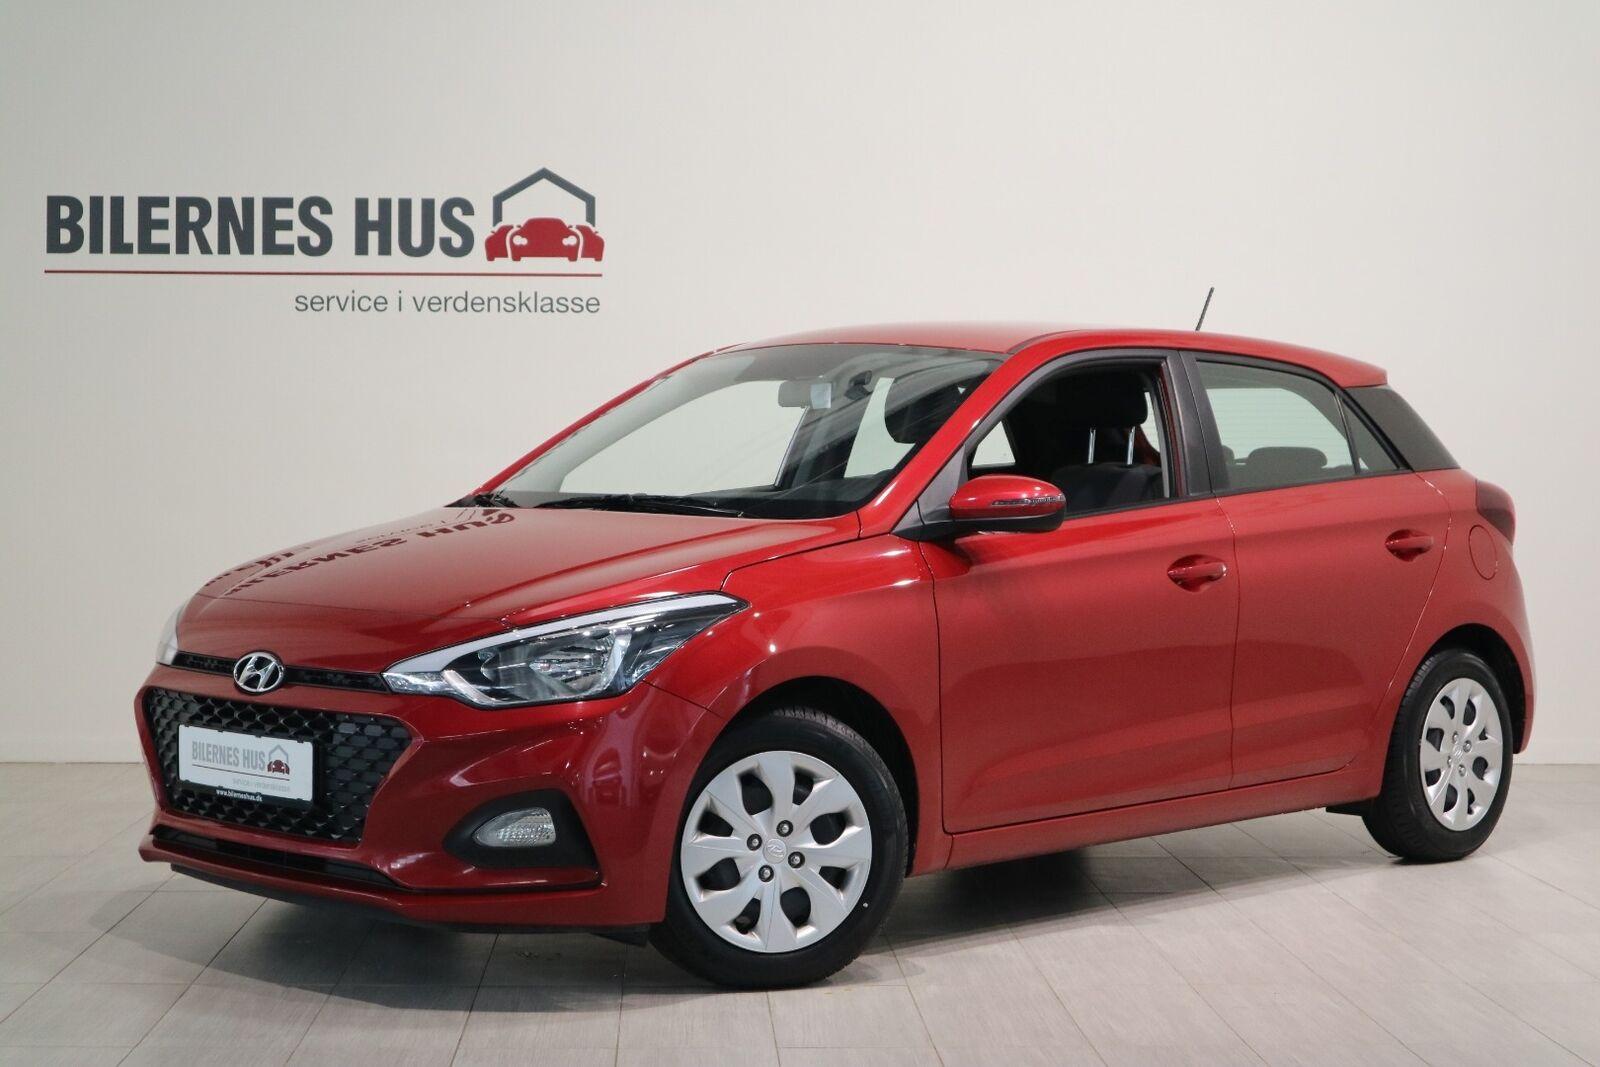 Hyundai i20 Billede 7